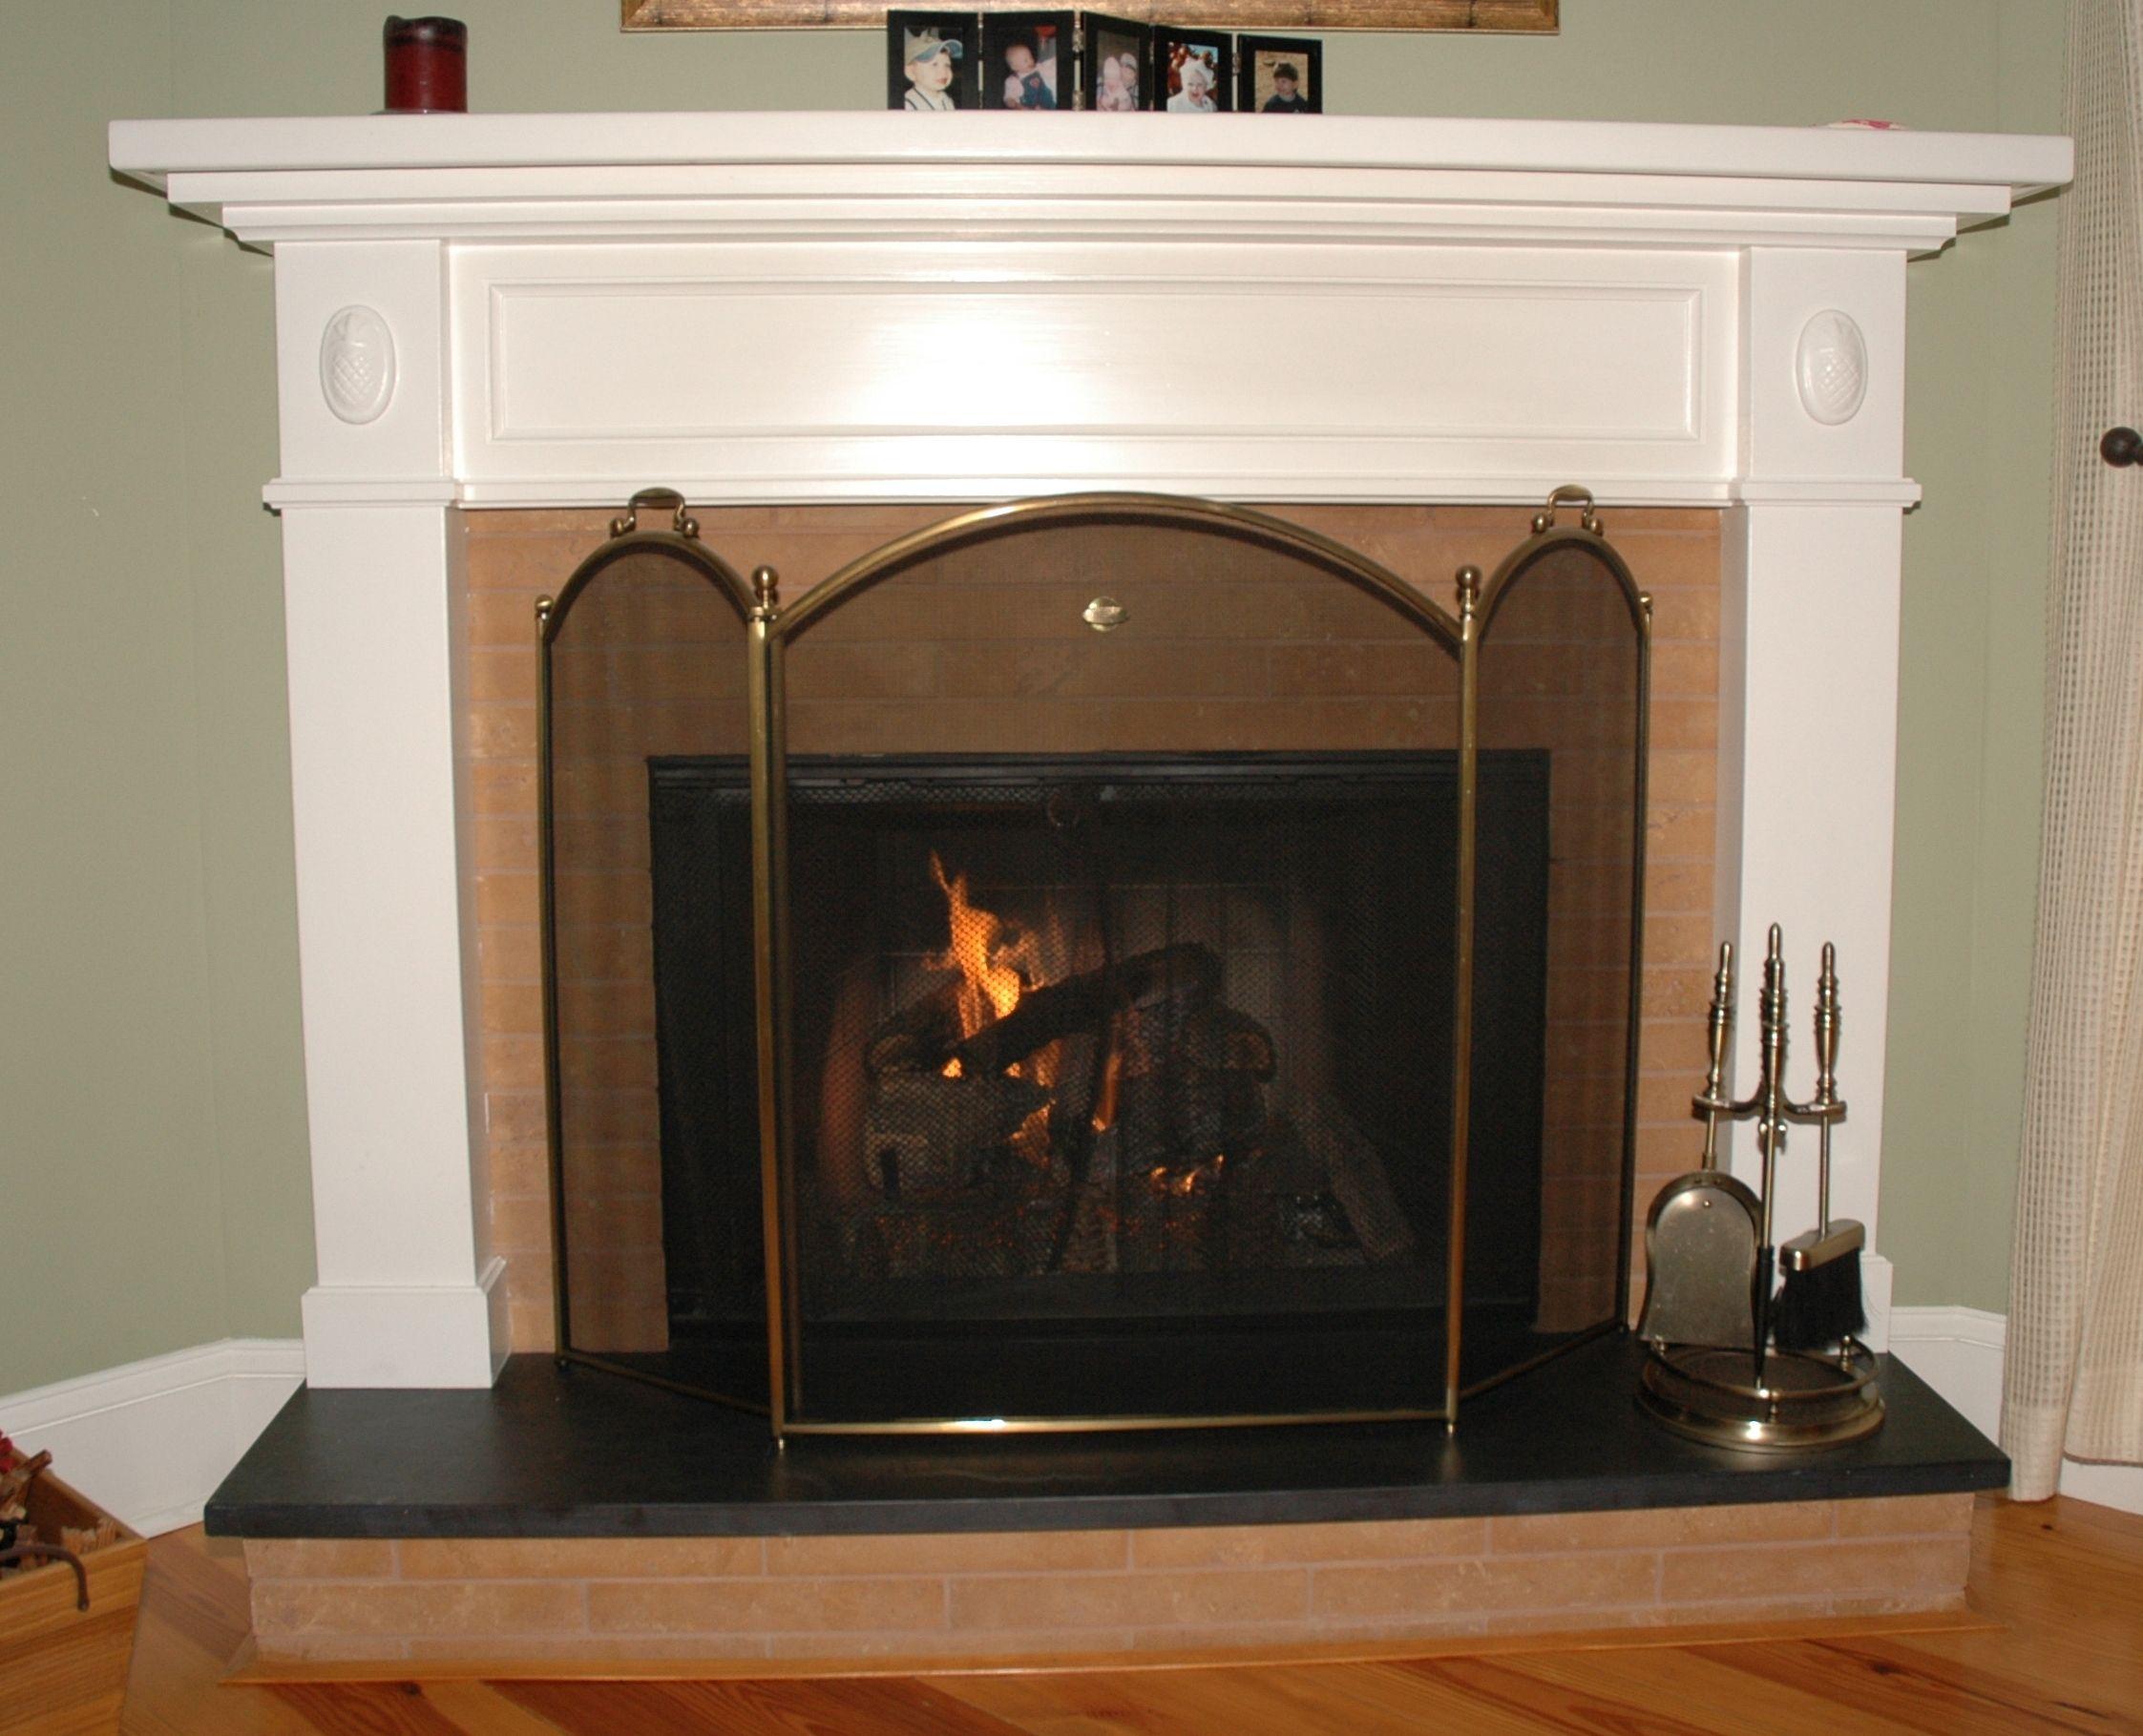 Brick fireplace with white mantel fireplaces pinterest white